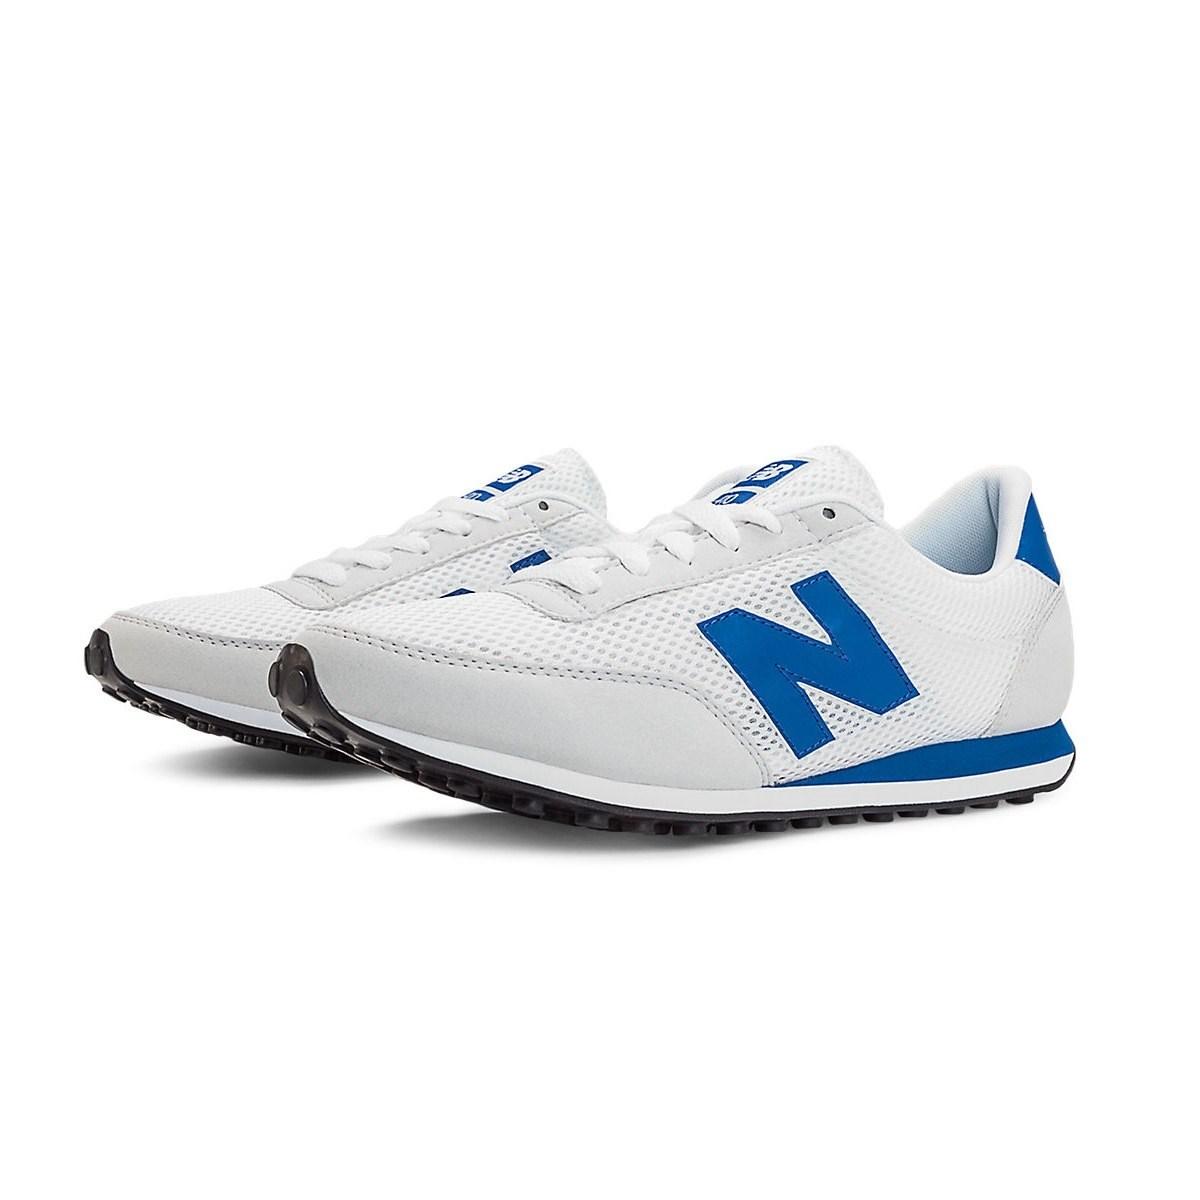 new balance u410 men 39 s sneaker trainers shoes microfiber ebay. Black Bedroom Furniture Sets. Home Design Ideas